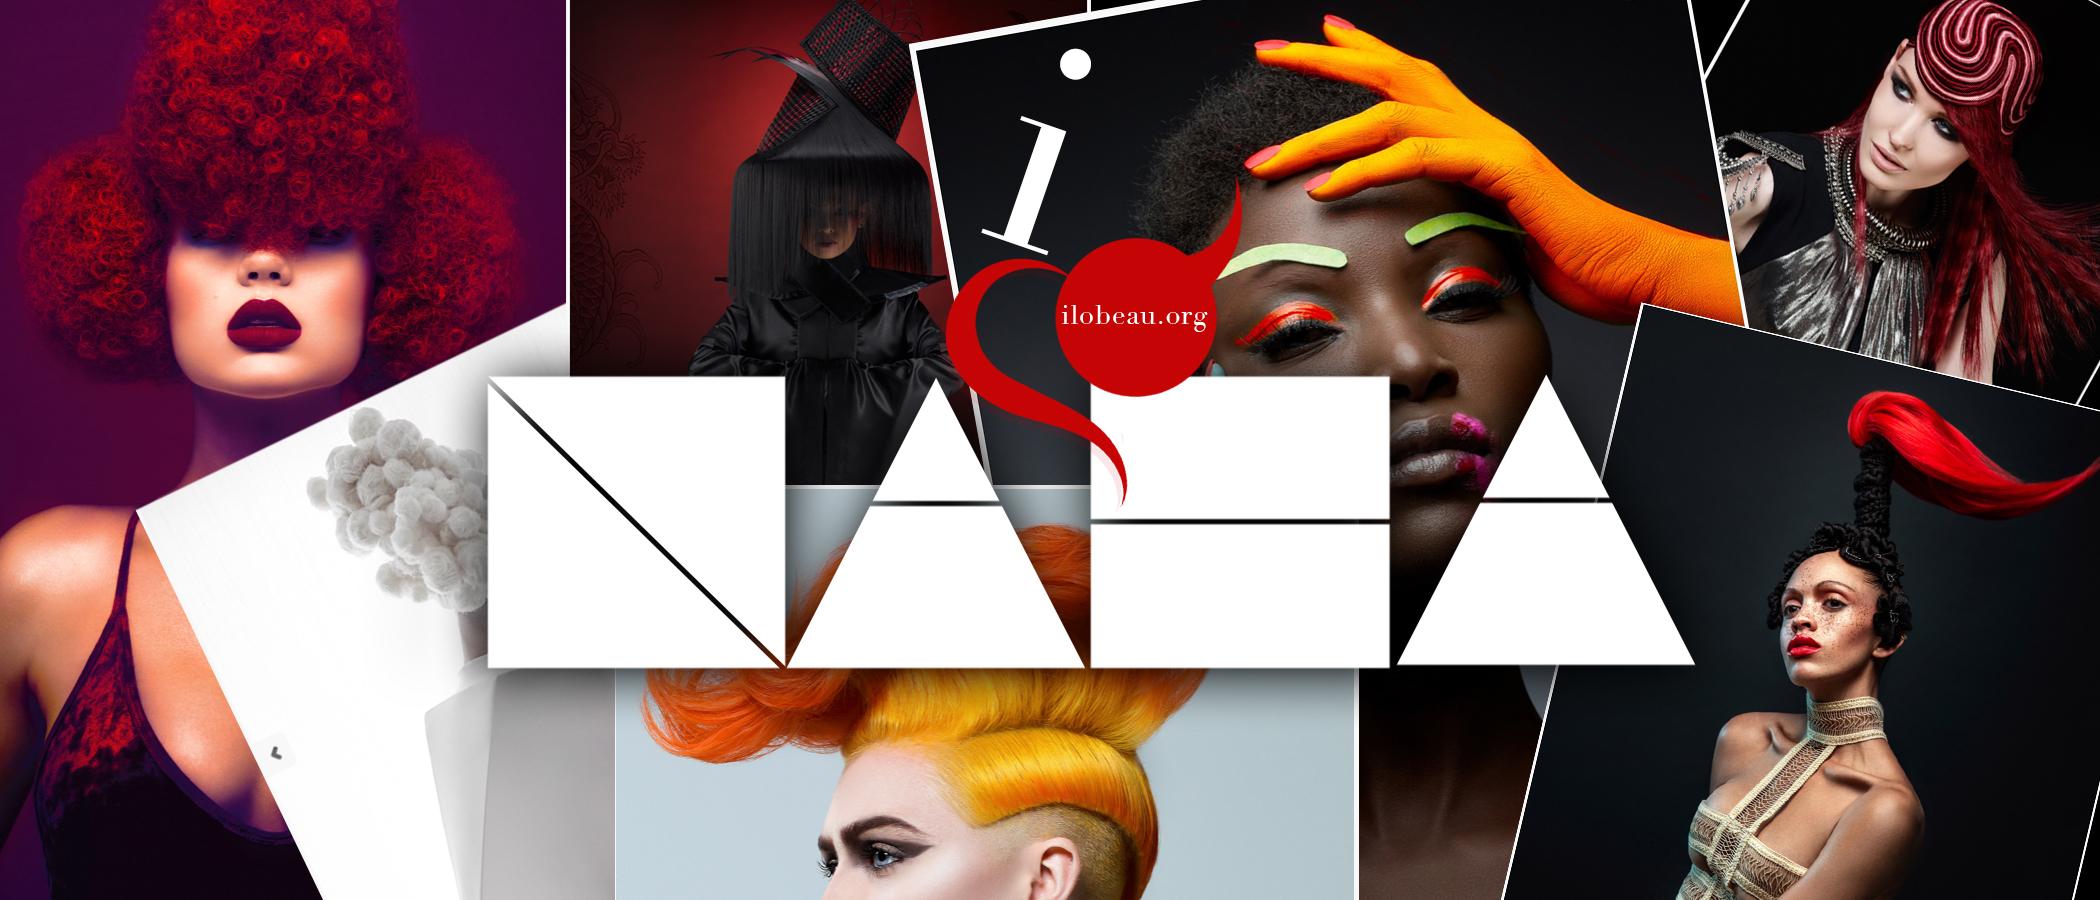 naha blog